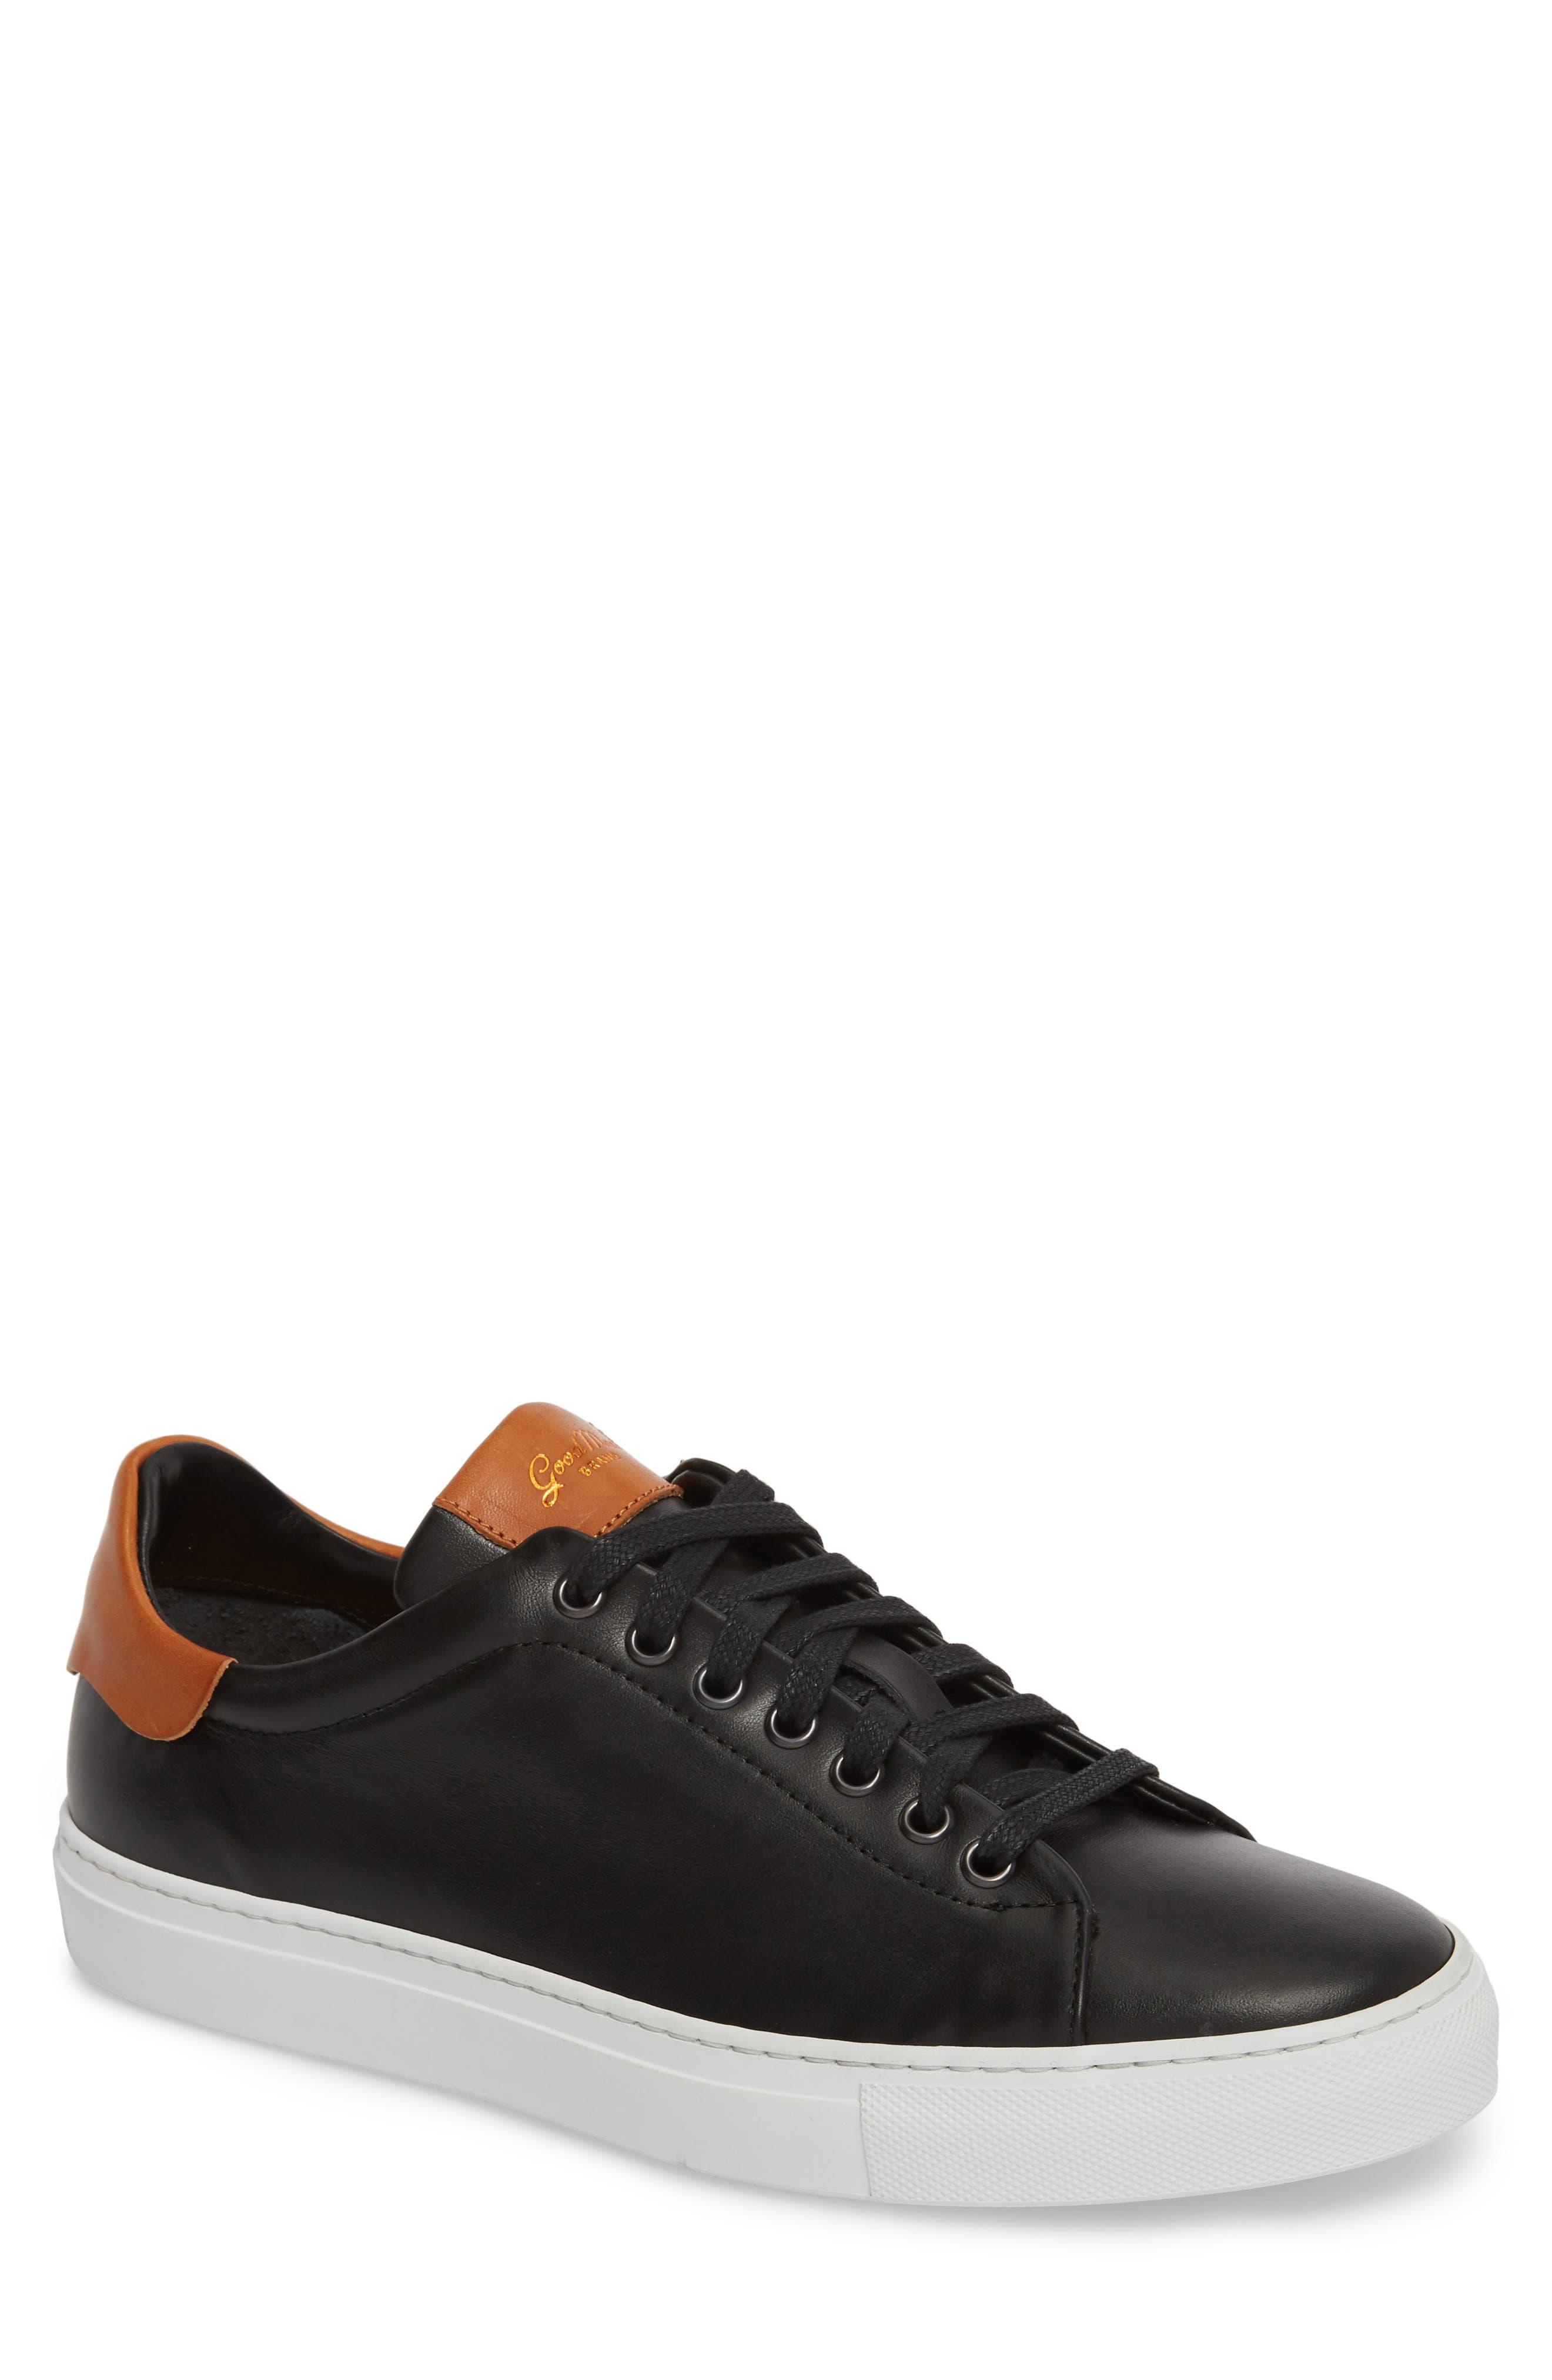 Legend Low Top Sneaker,                         Main,                         color, BLACK/ VACHETTA LEATHER